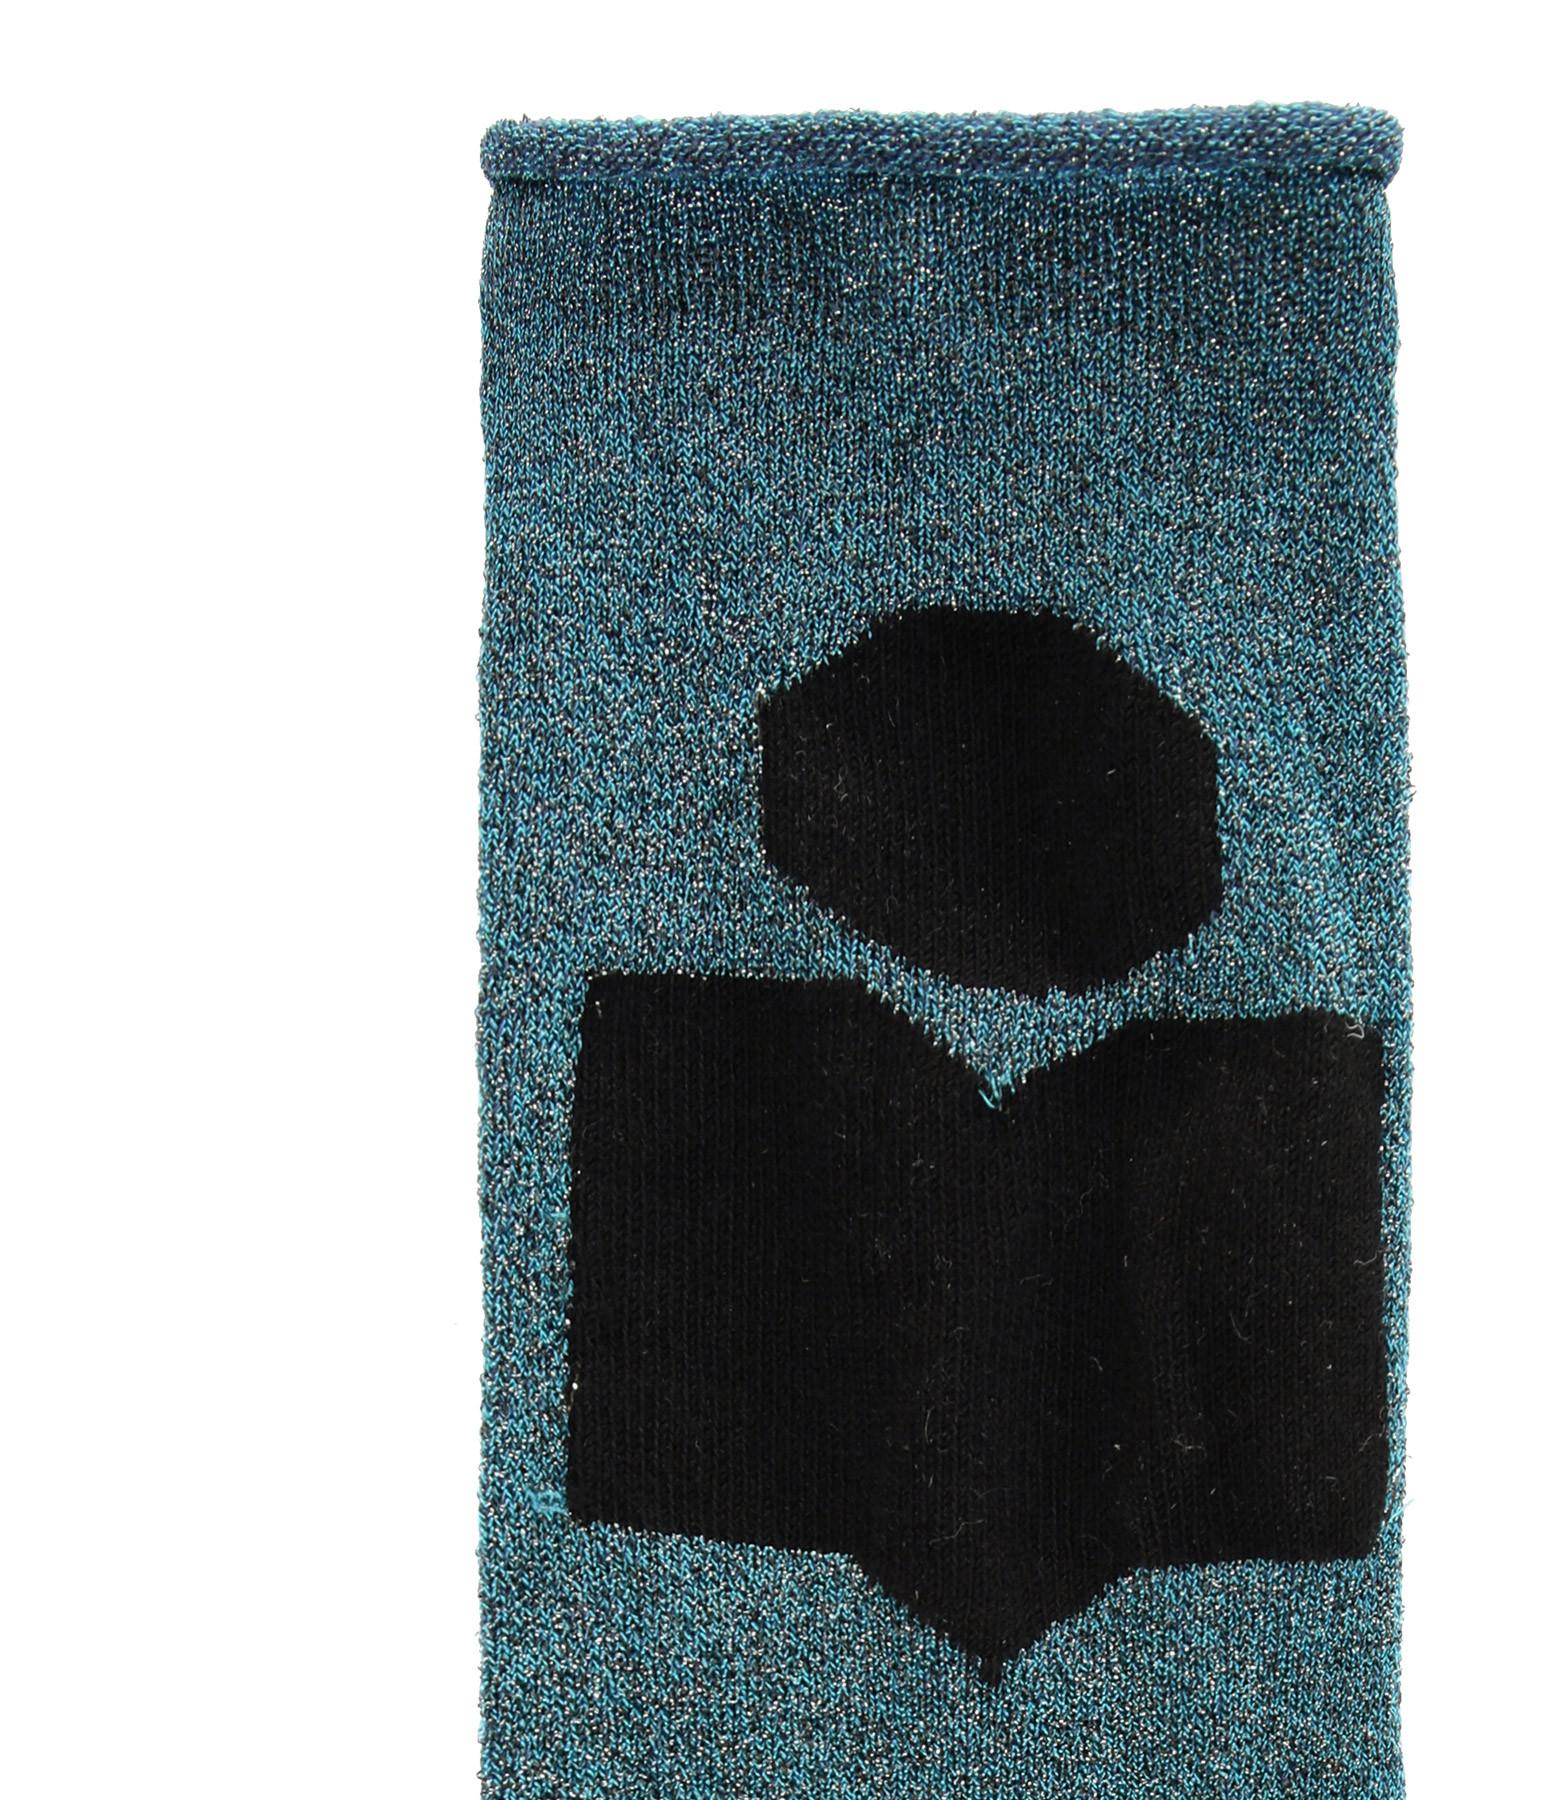 ISABEL MARANT - Chaussettes Slaze Vert Celadon